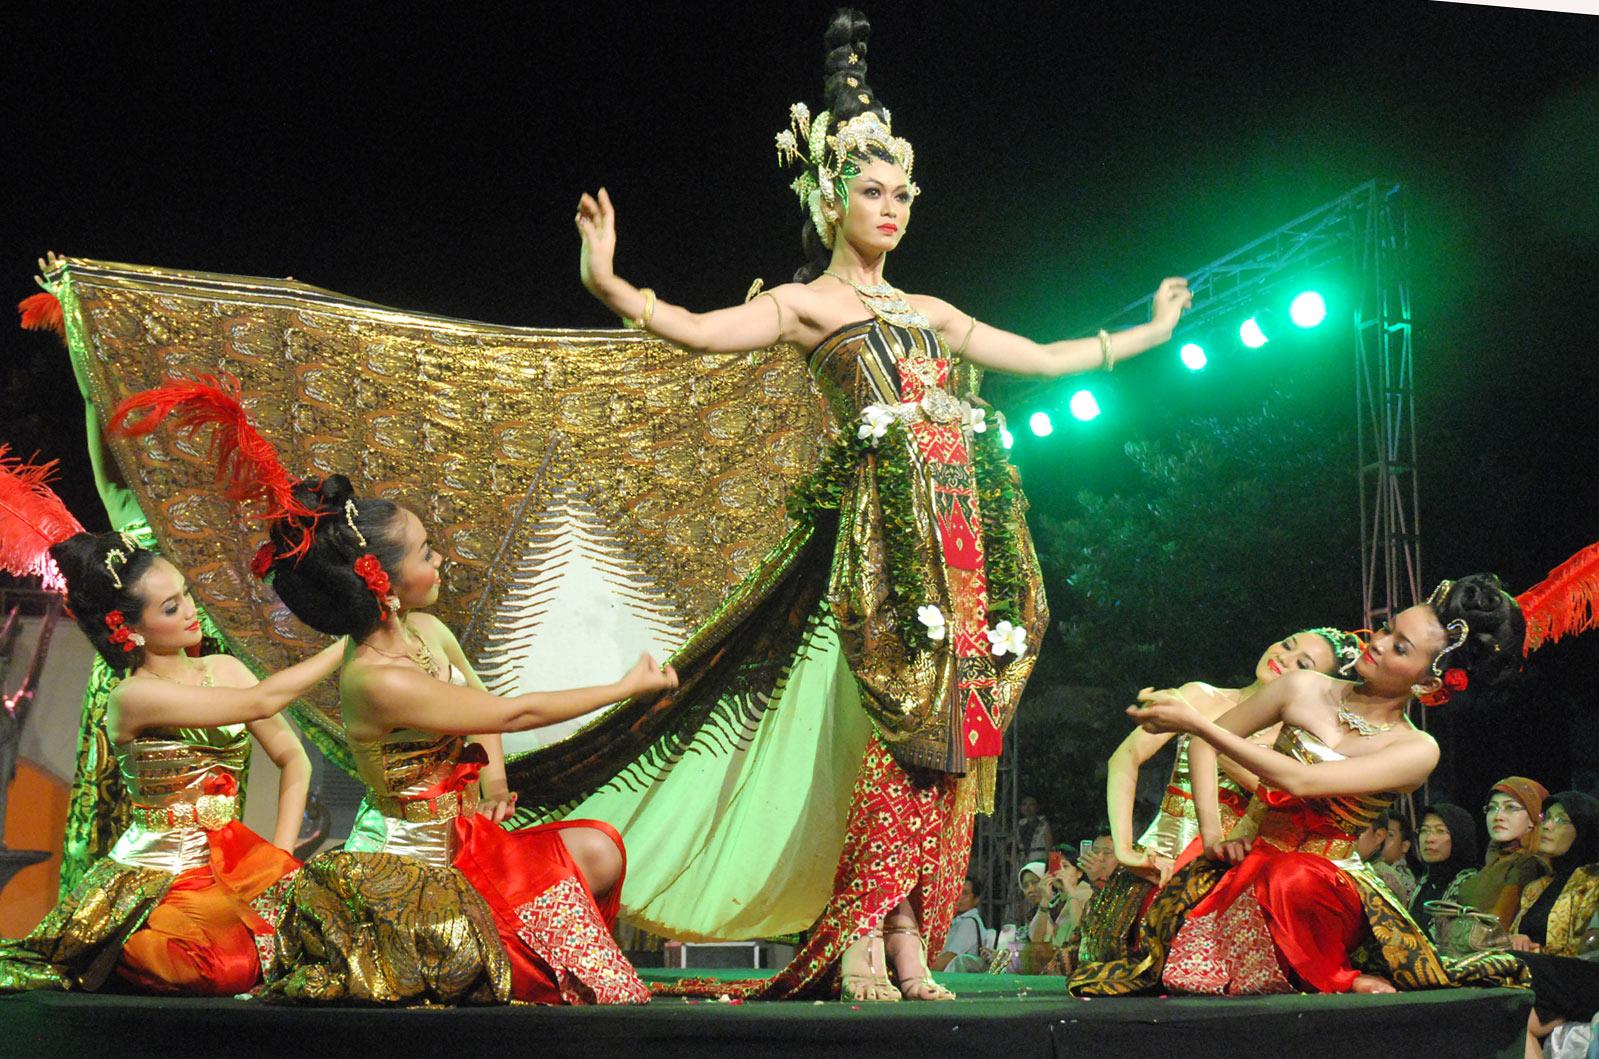 http://1.bp.blogspot.com/_DvLGDCnIwEY/TUv9JF5r8WI/AAAAAAAAAC0/jQhmiDF6azg/s1600/Jogja-Dance.jpg